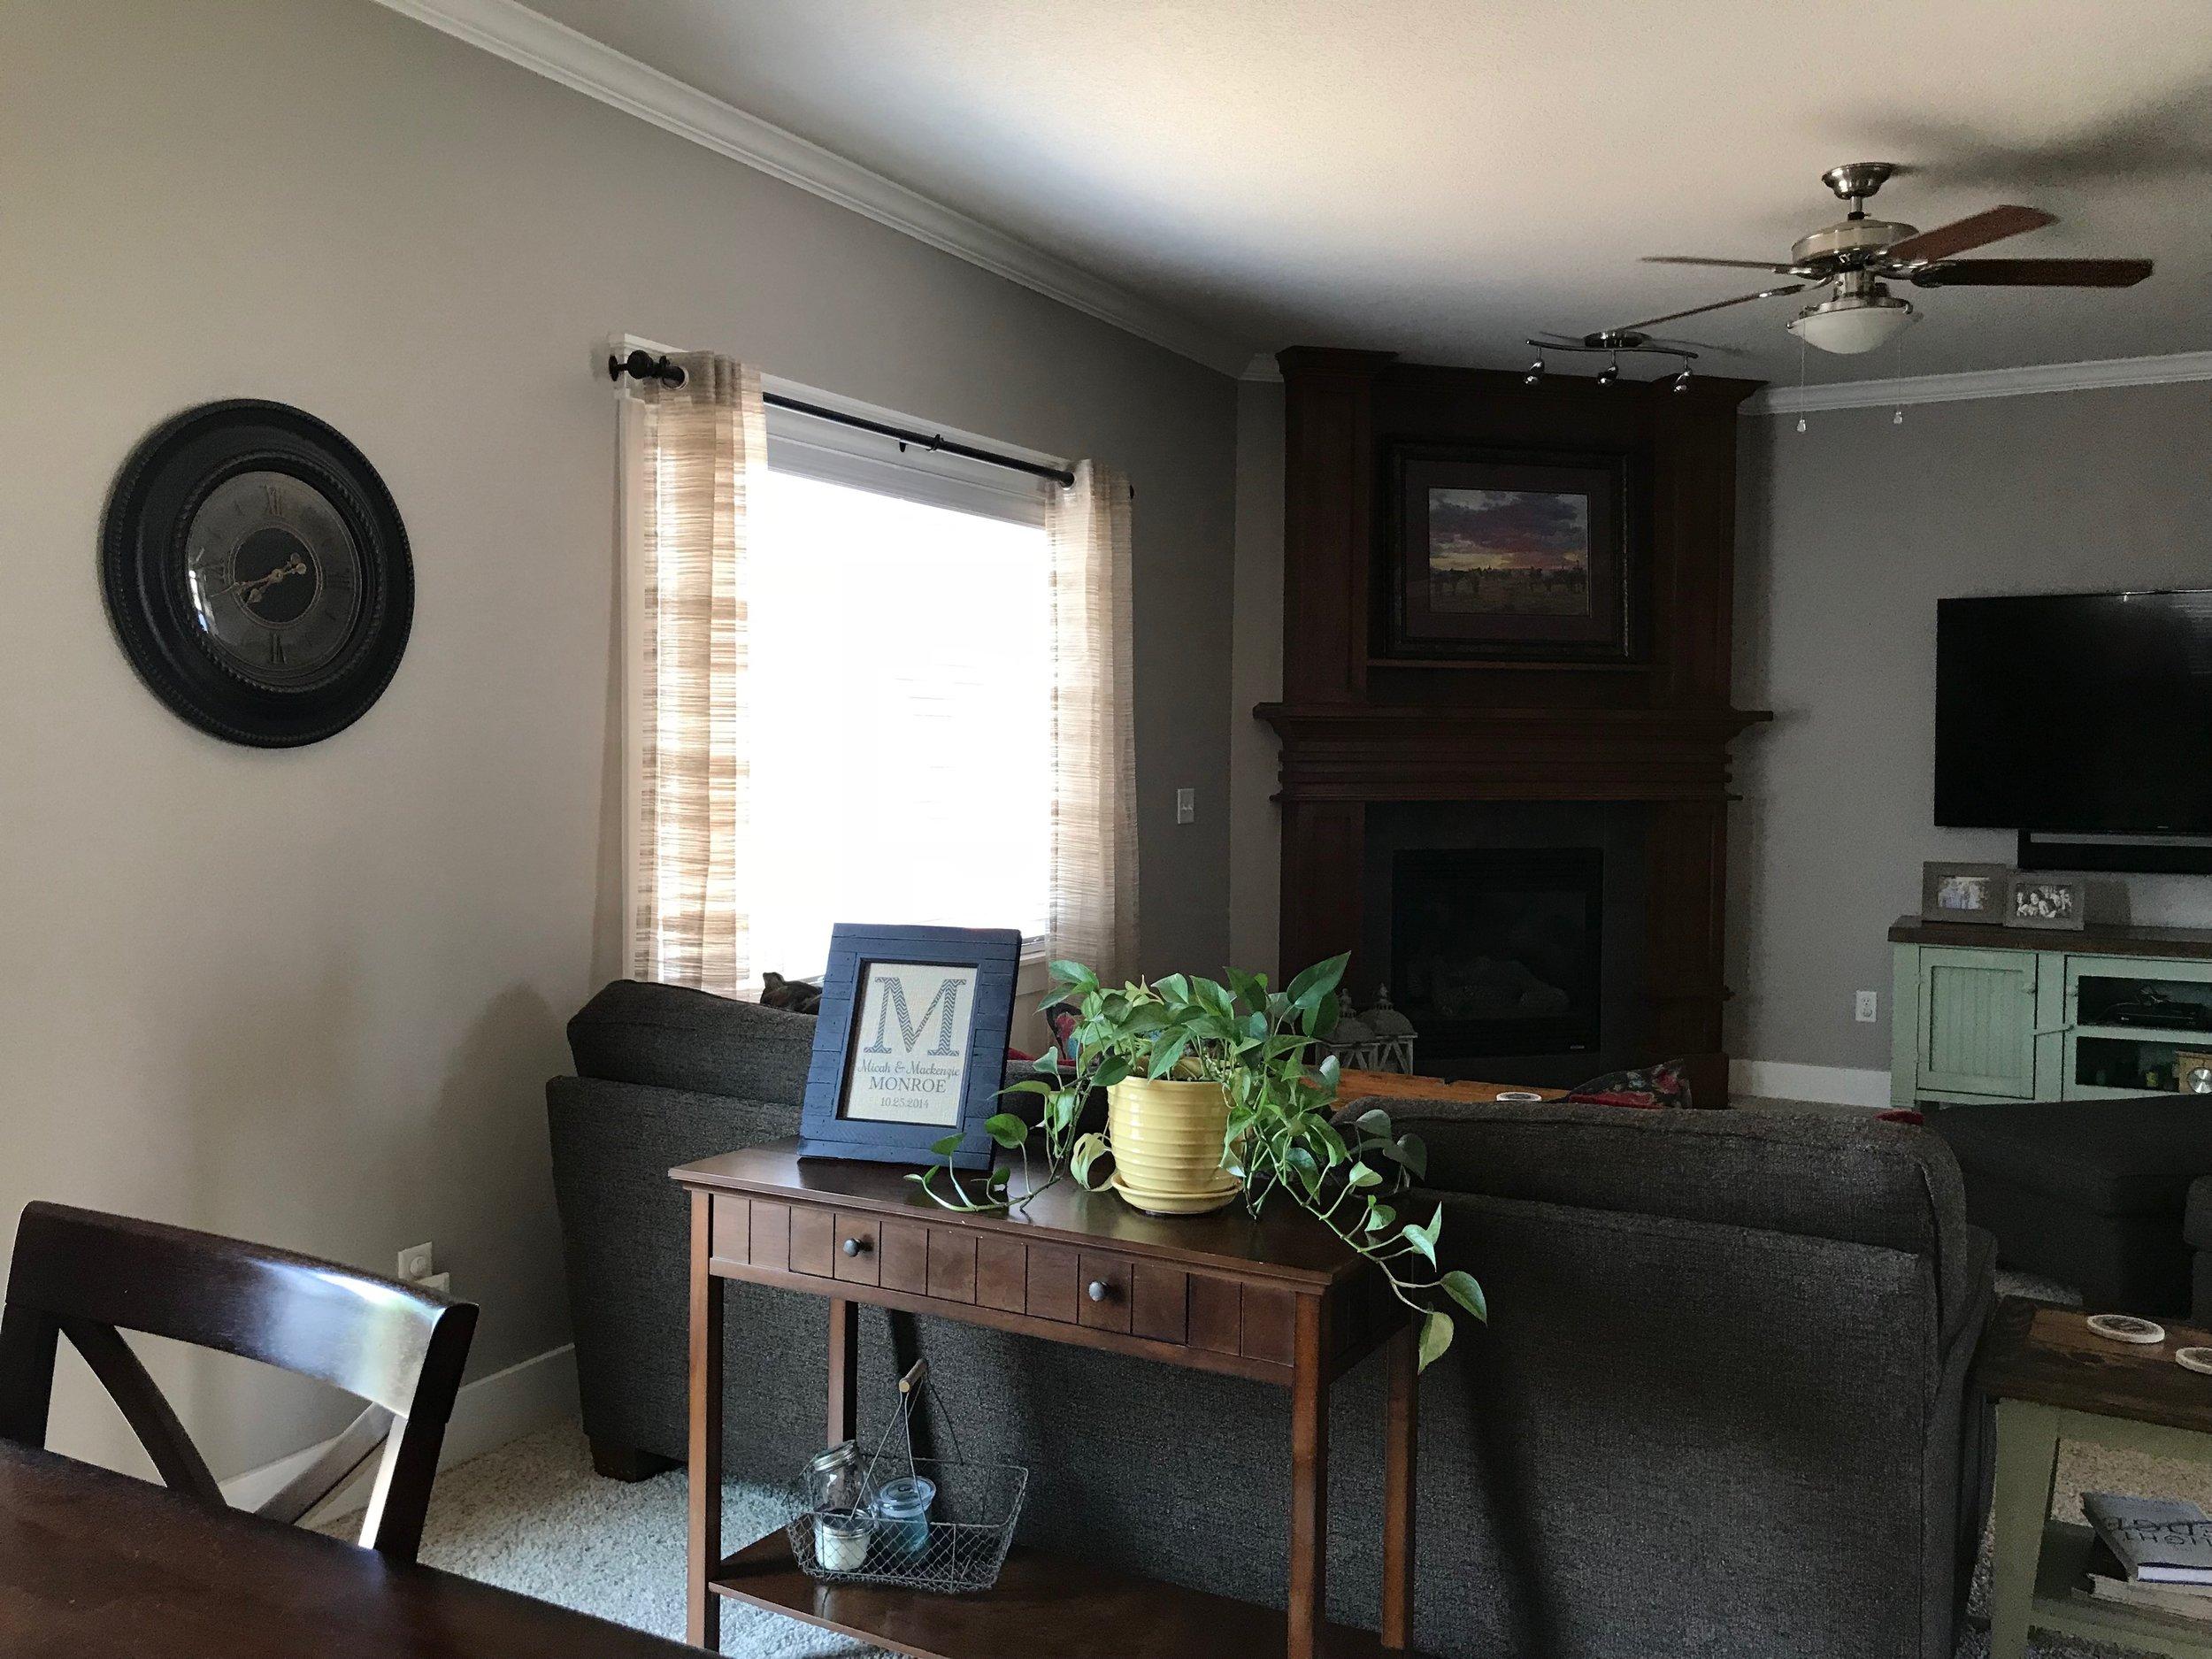 How to Make Your (Temporary) House Feel like a Home | hprallandco.com